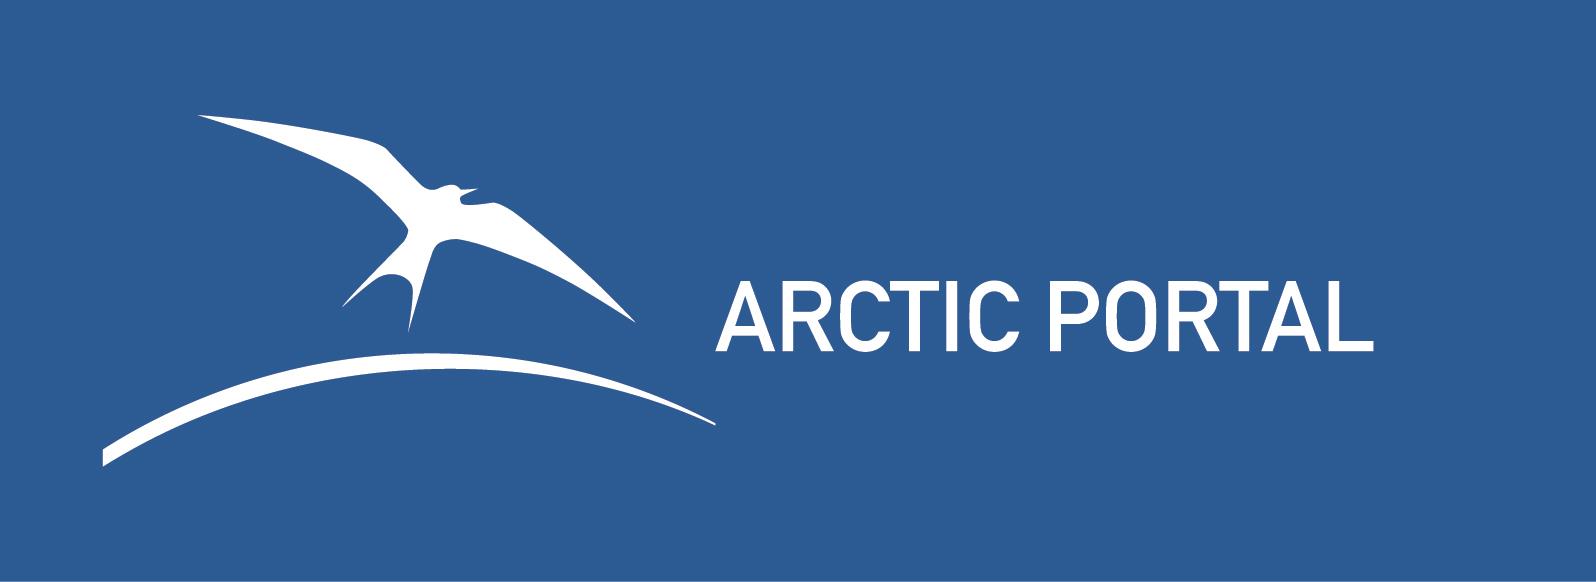 Logo Arctic Portal The Arctic Gateway